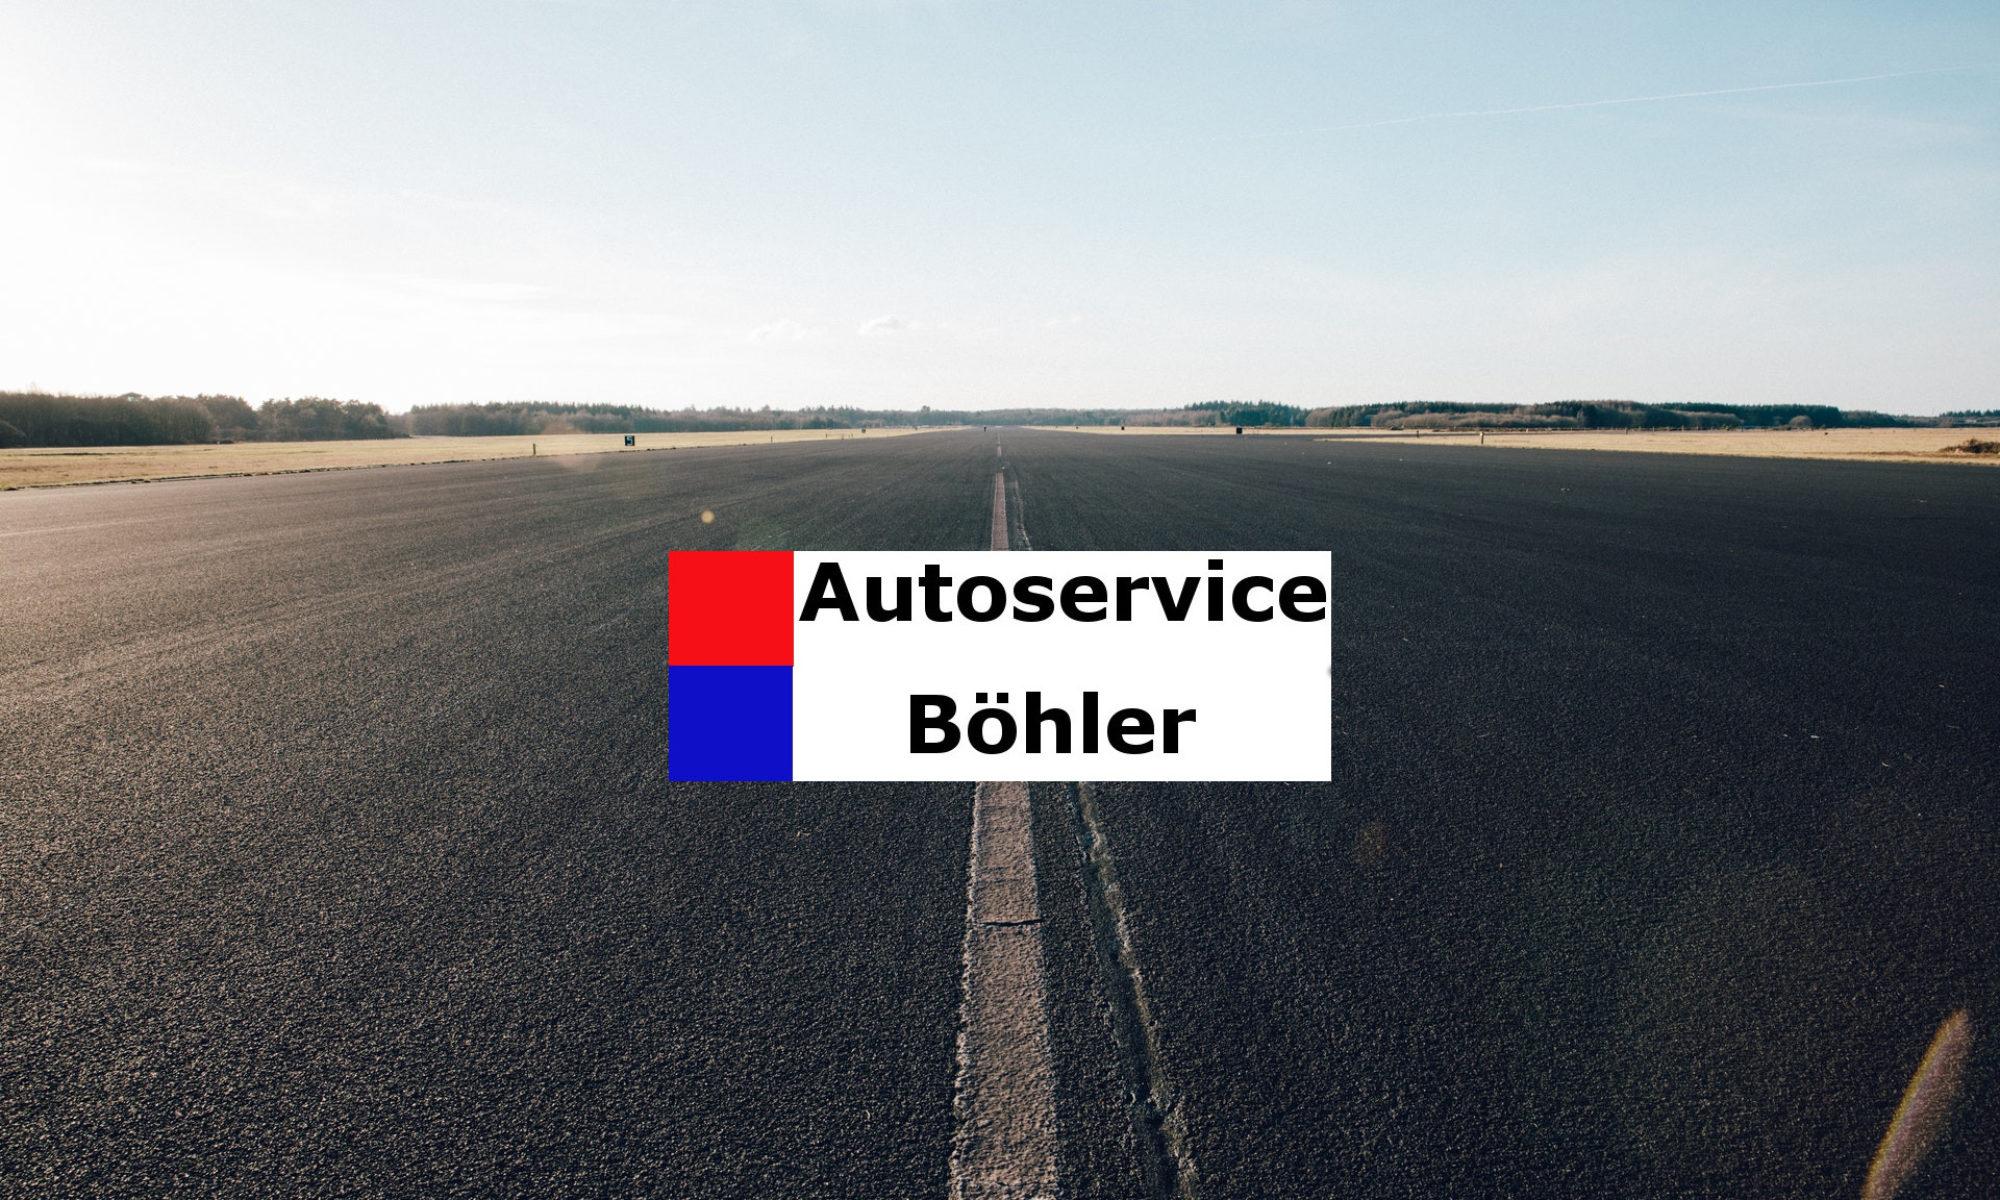 Autoservice-Boehler